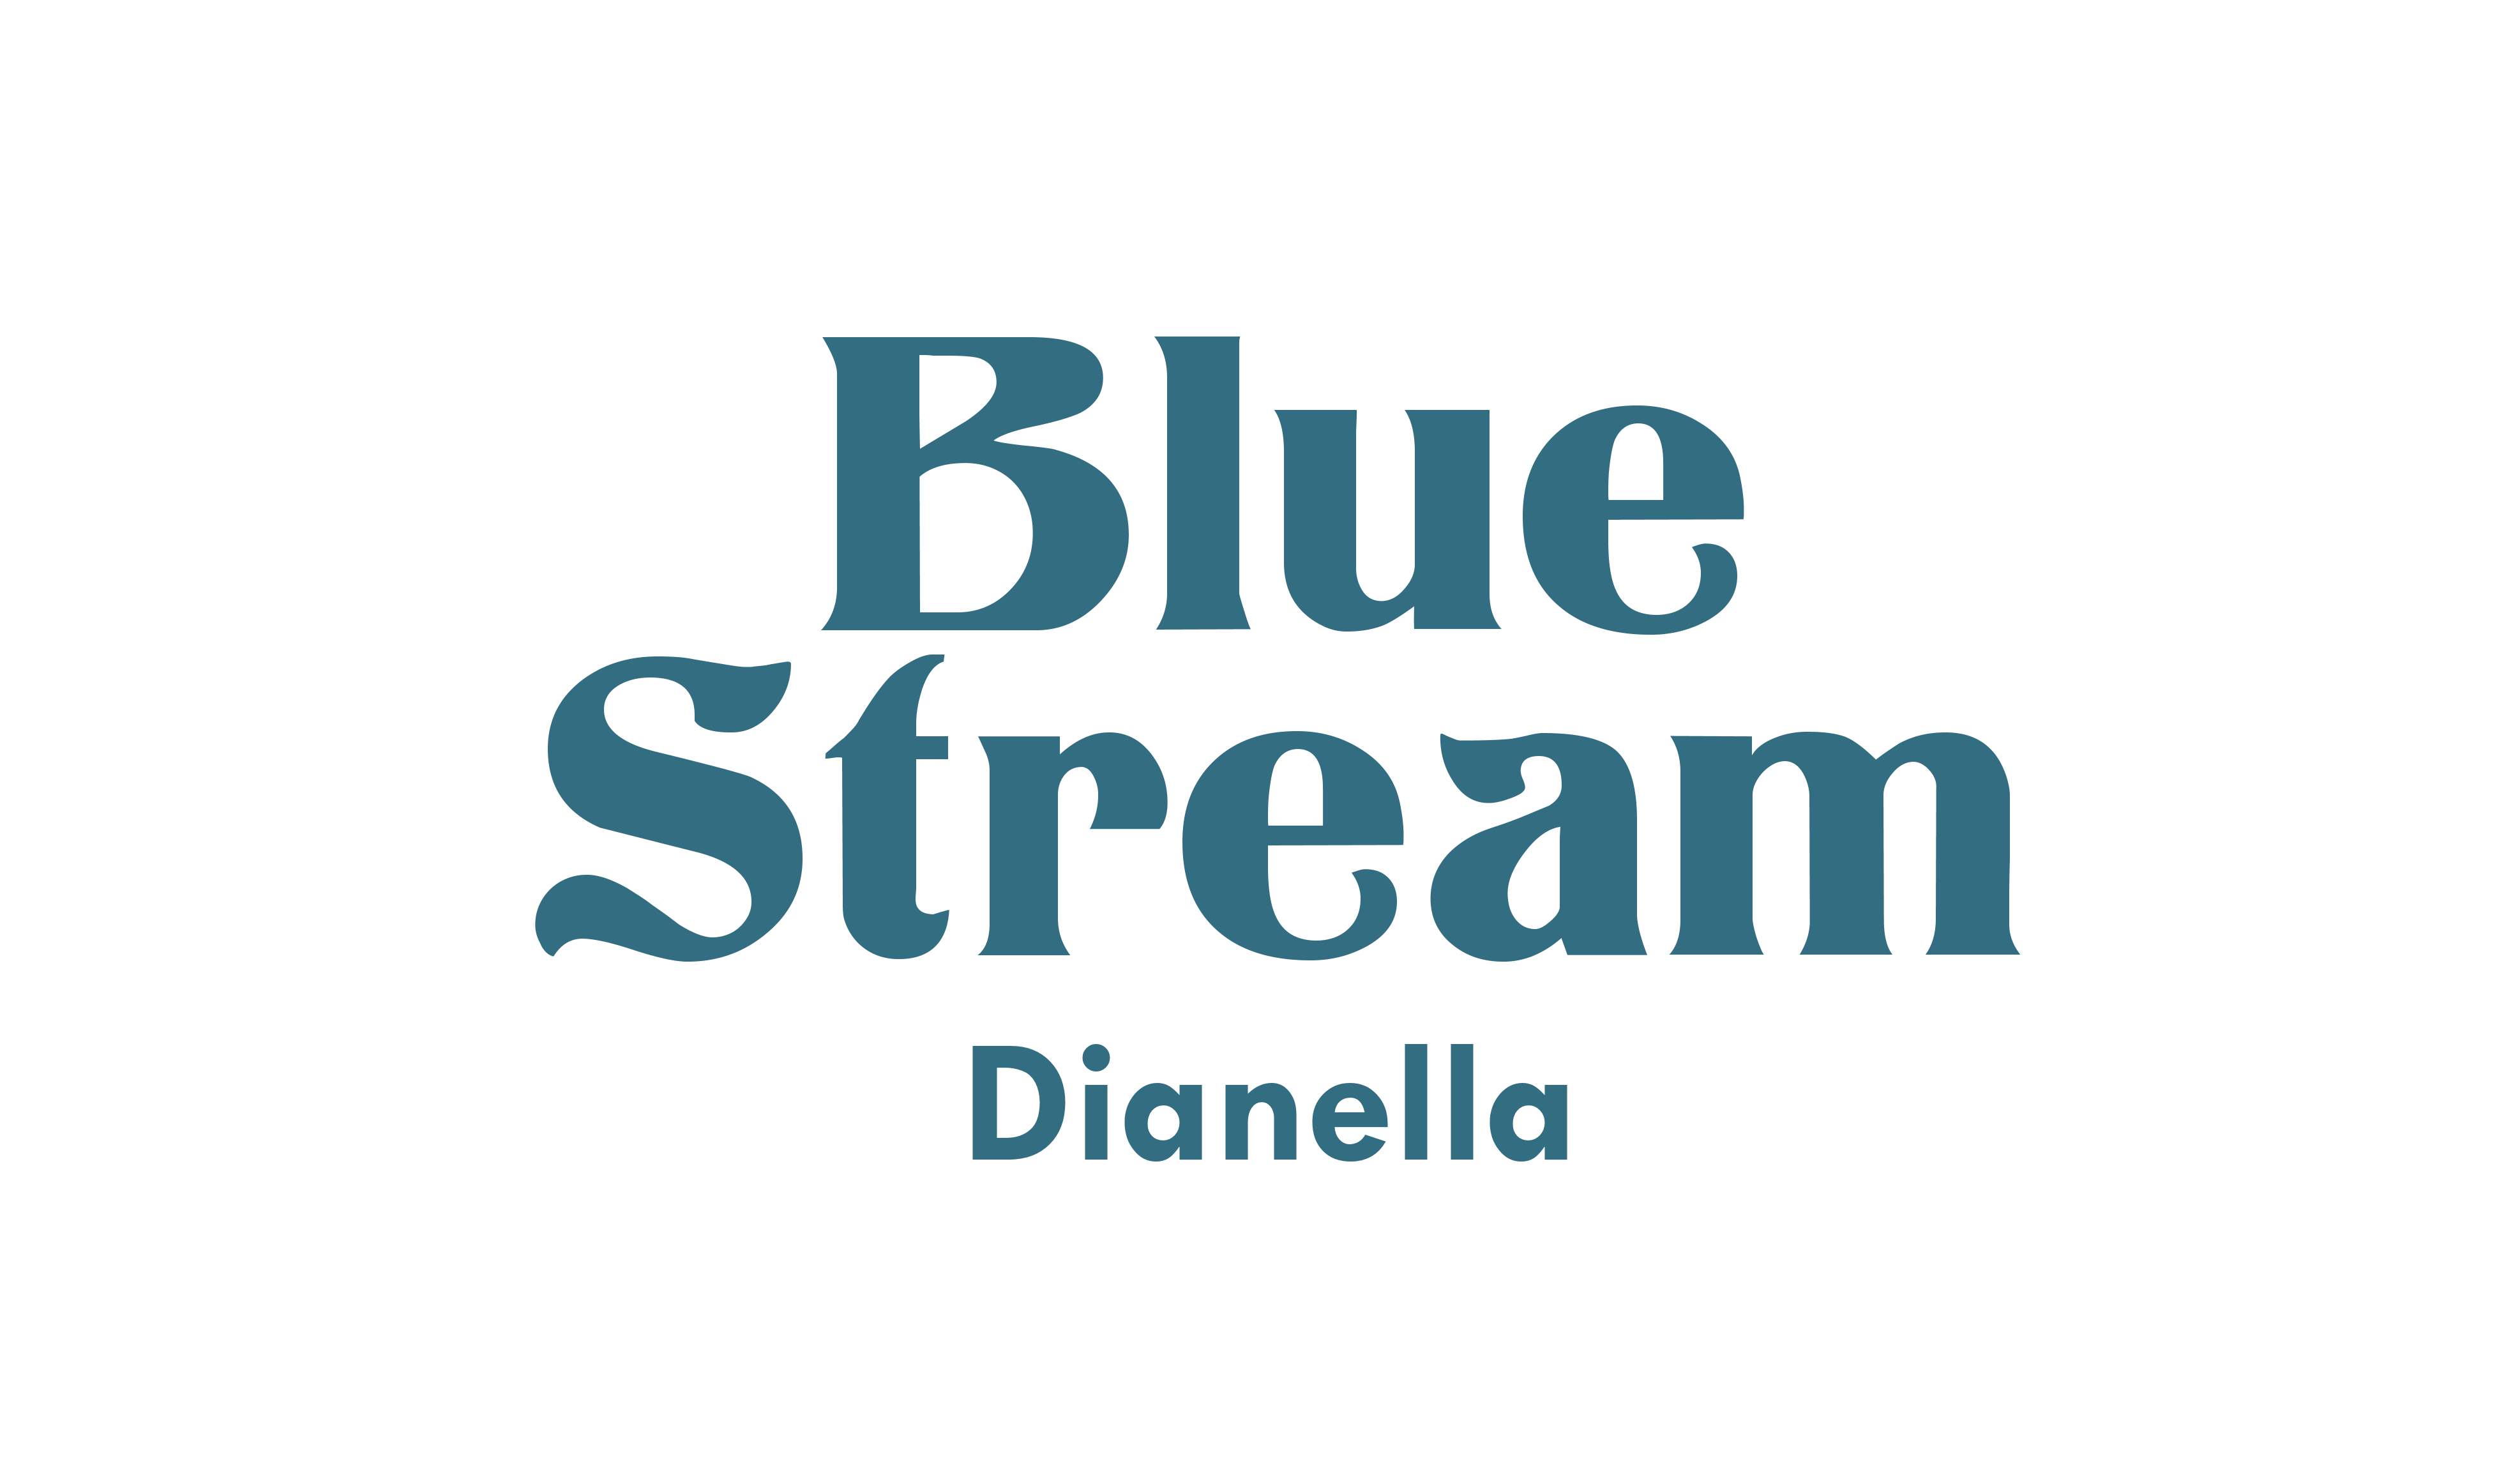 logo-Dianella Blue Stream